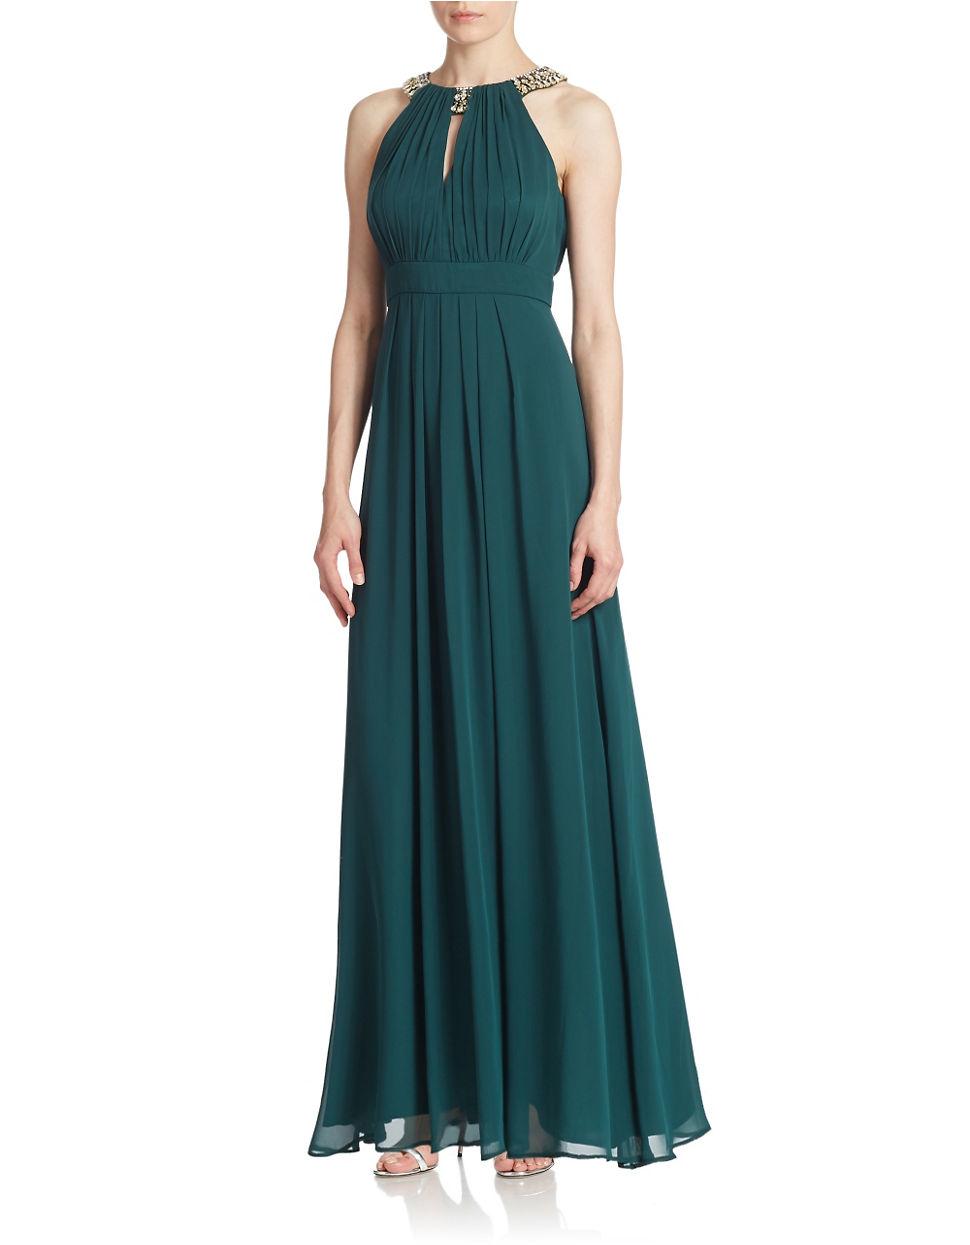 Lyst - Eliza J Embellished Halter Gown in Green